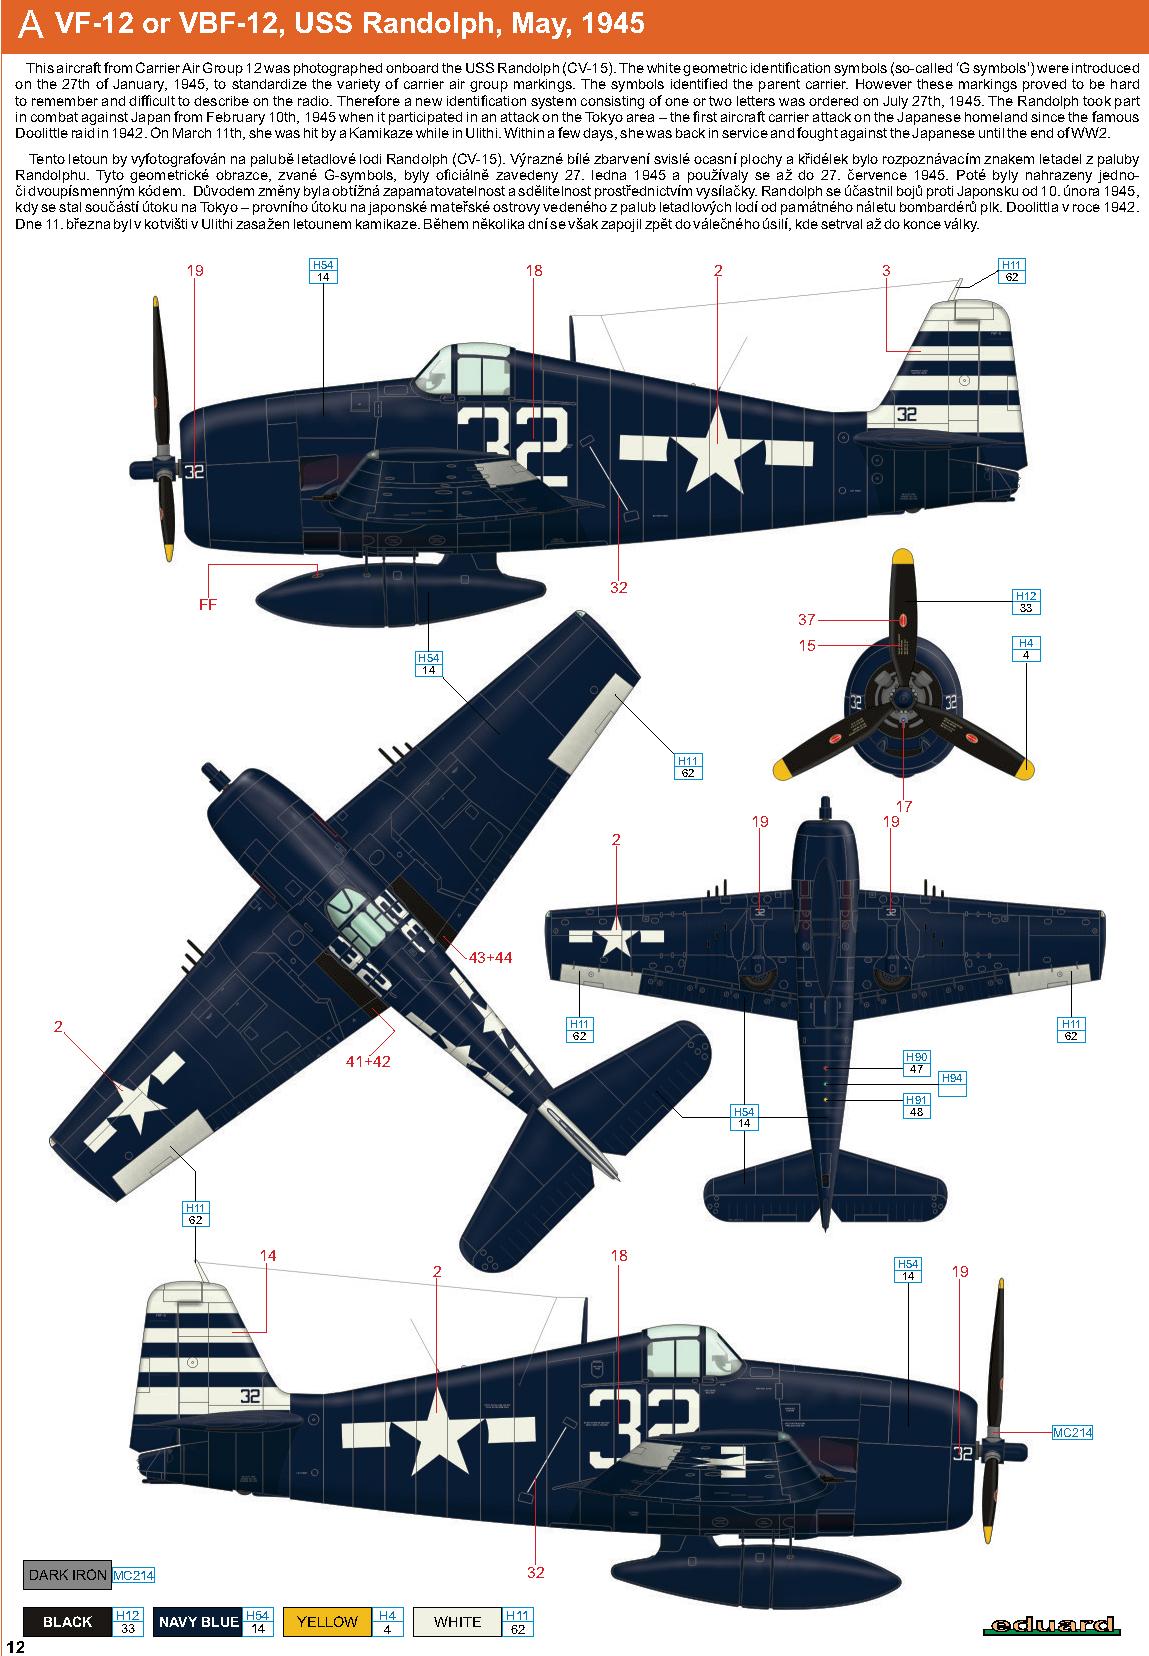 Grumman F6F 5 Hellcat VF 12 White 32 aboard CV 15 USS Randolph 1945 0C